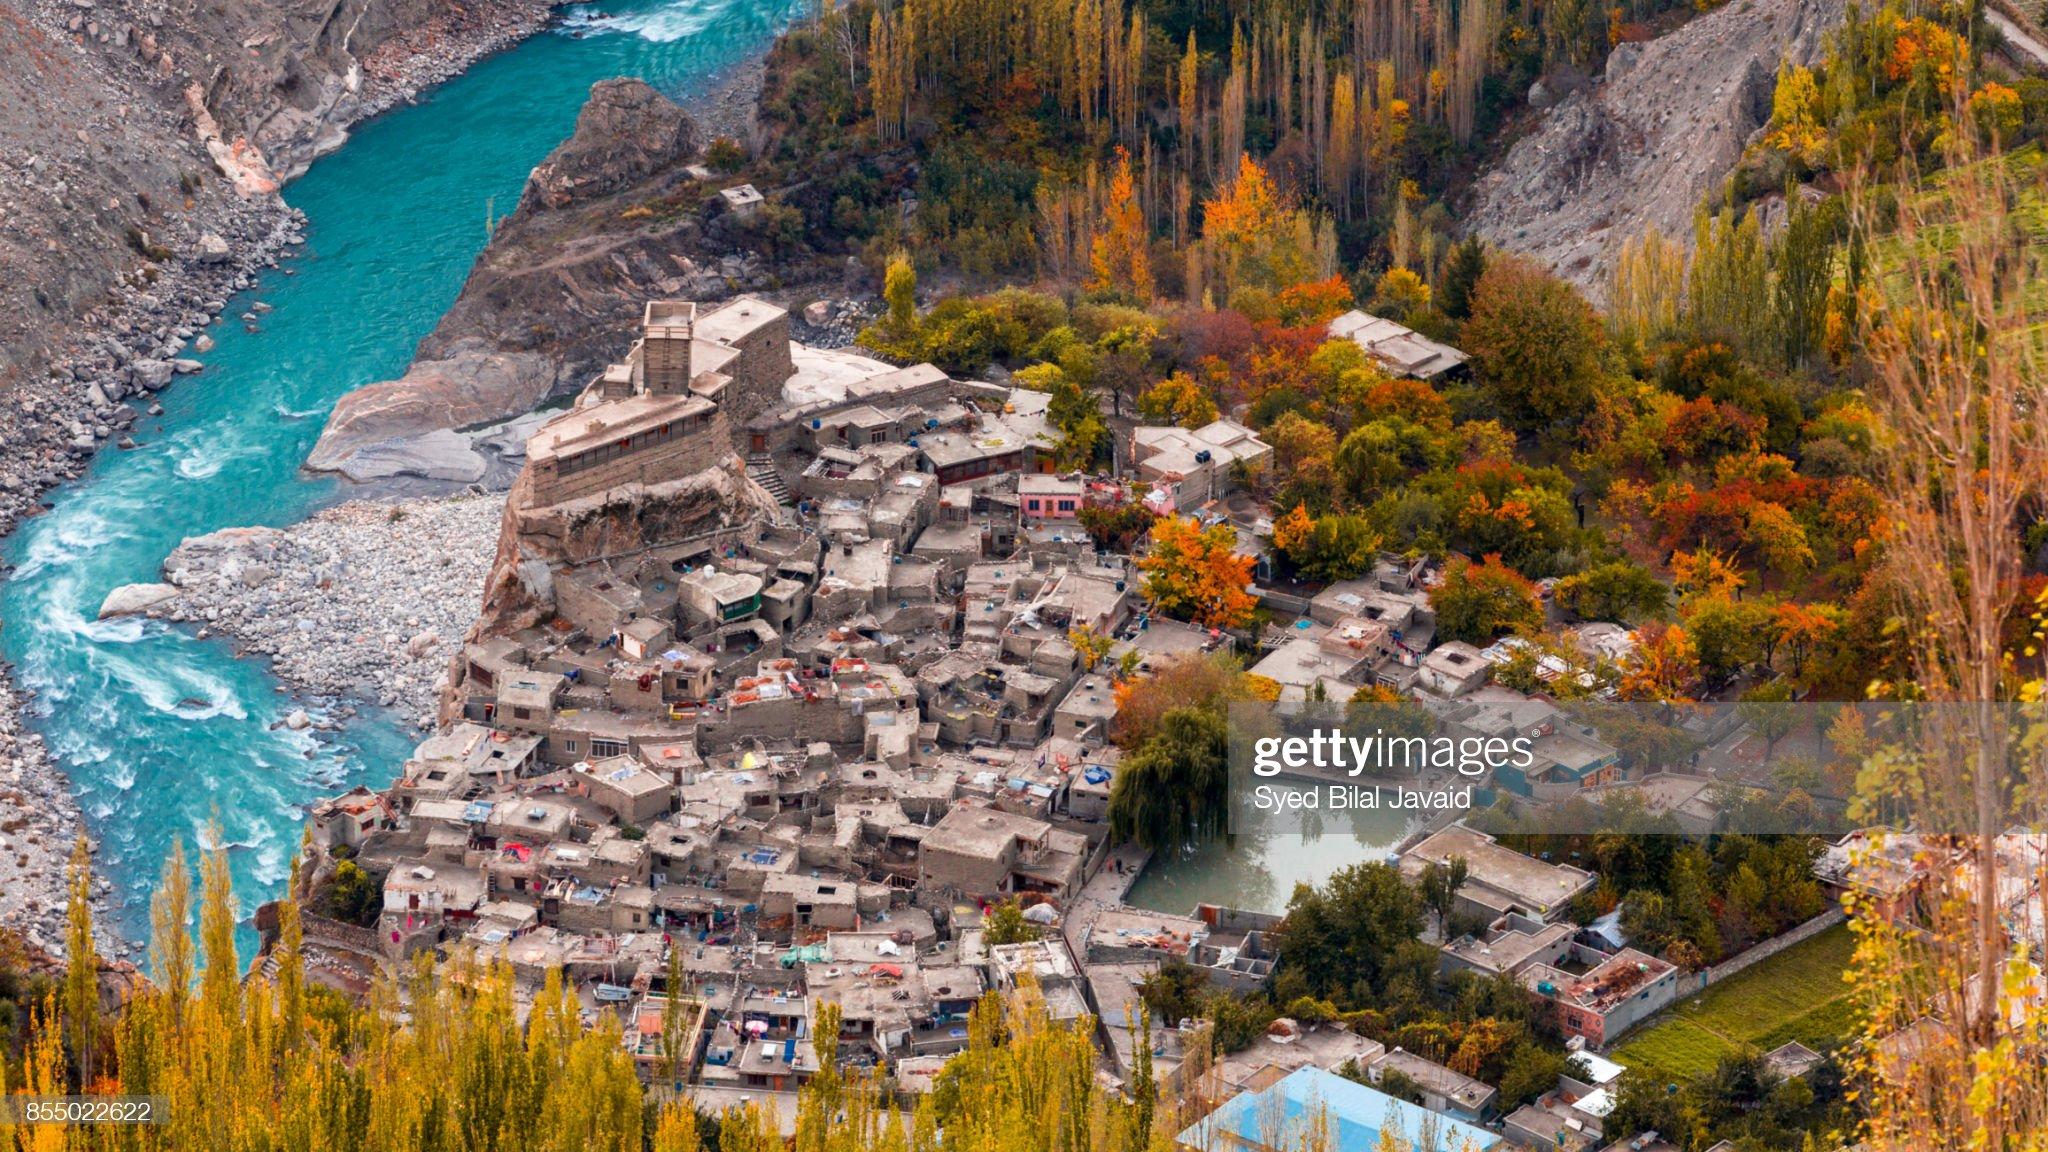 Altit Fort Hunza, Gilgit-Baltistan. Forts in Gilgit-Baltistan.